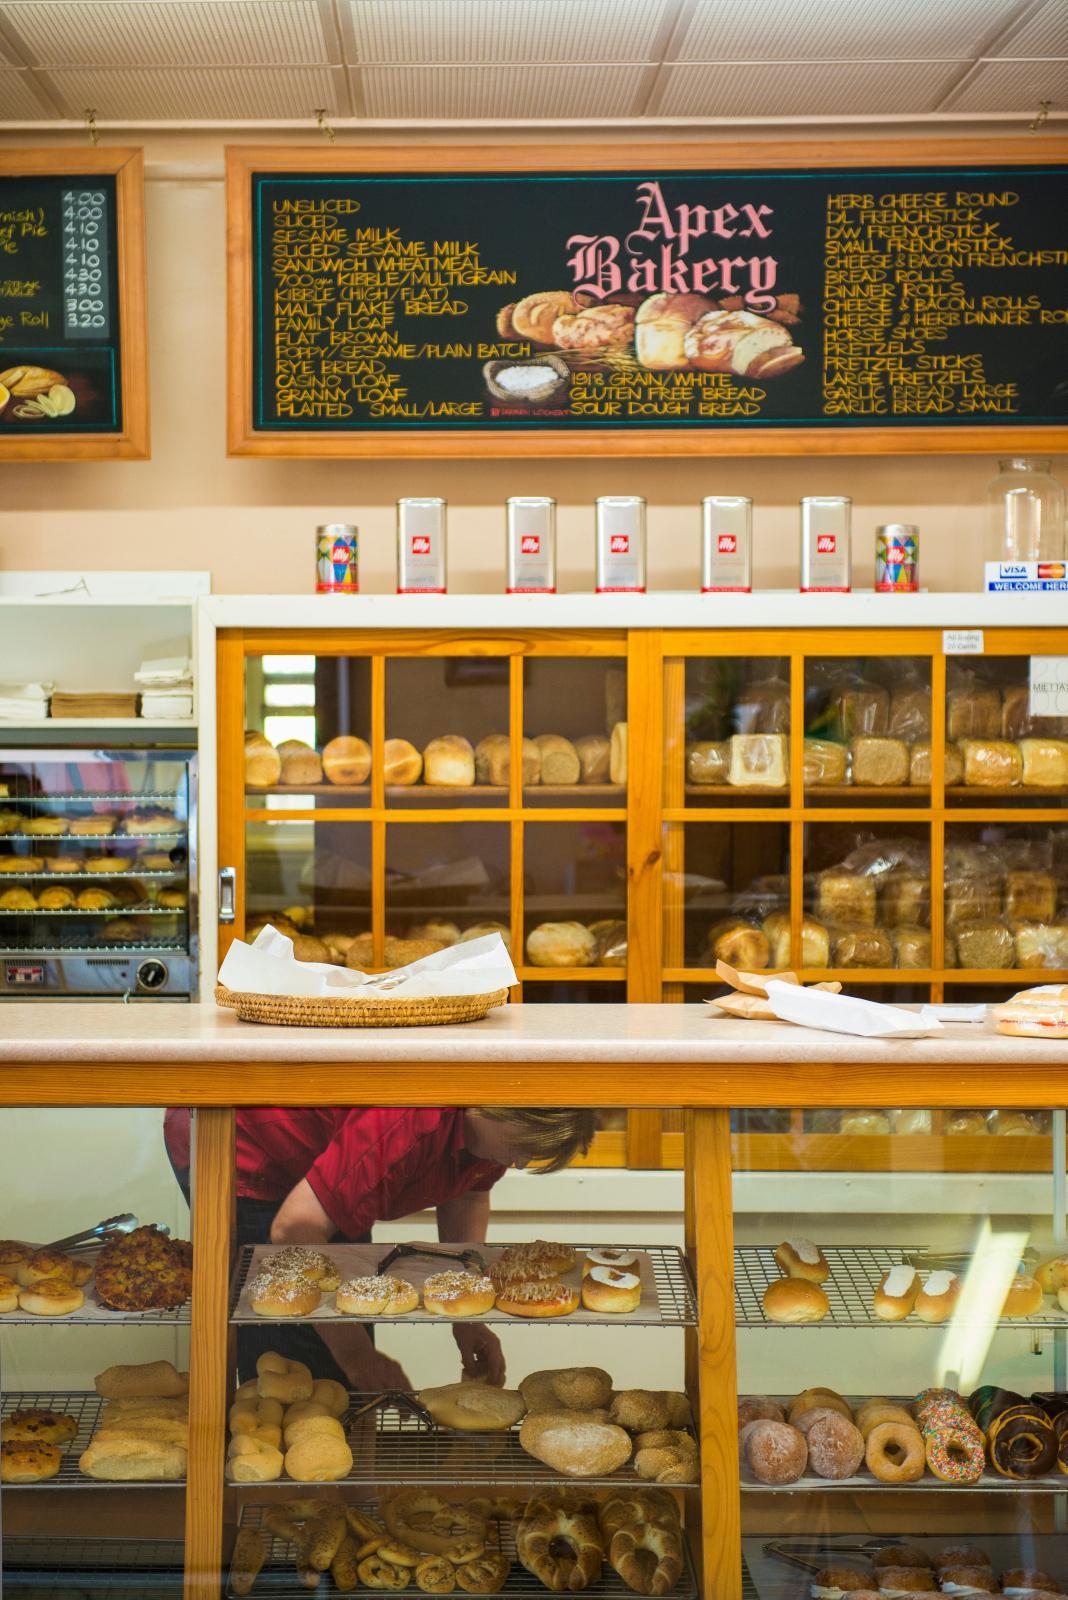 Apex Bakery